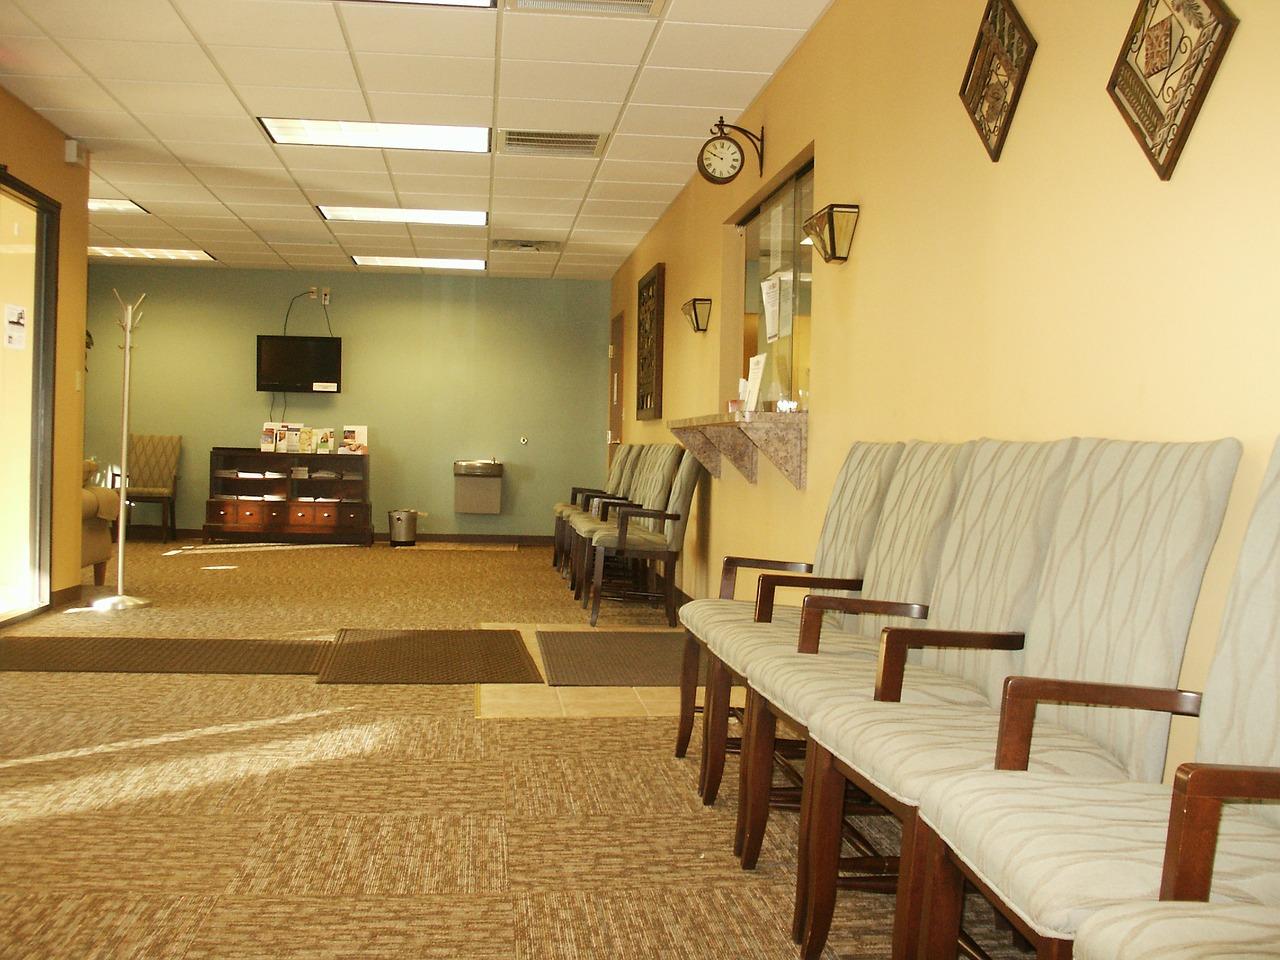 Download free photo of Waiting room,anteroom,doctors,room,examining - from  needpix.com